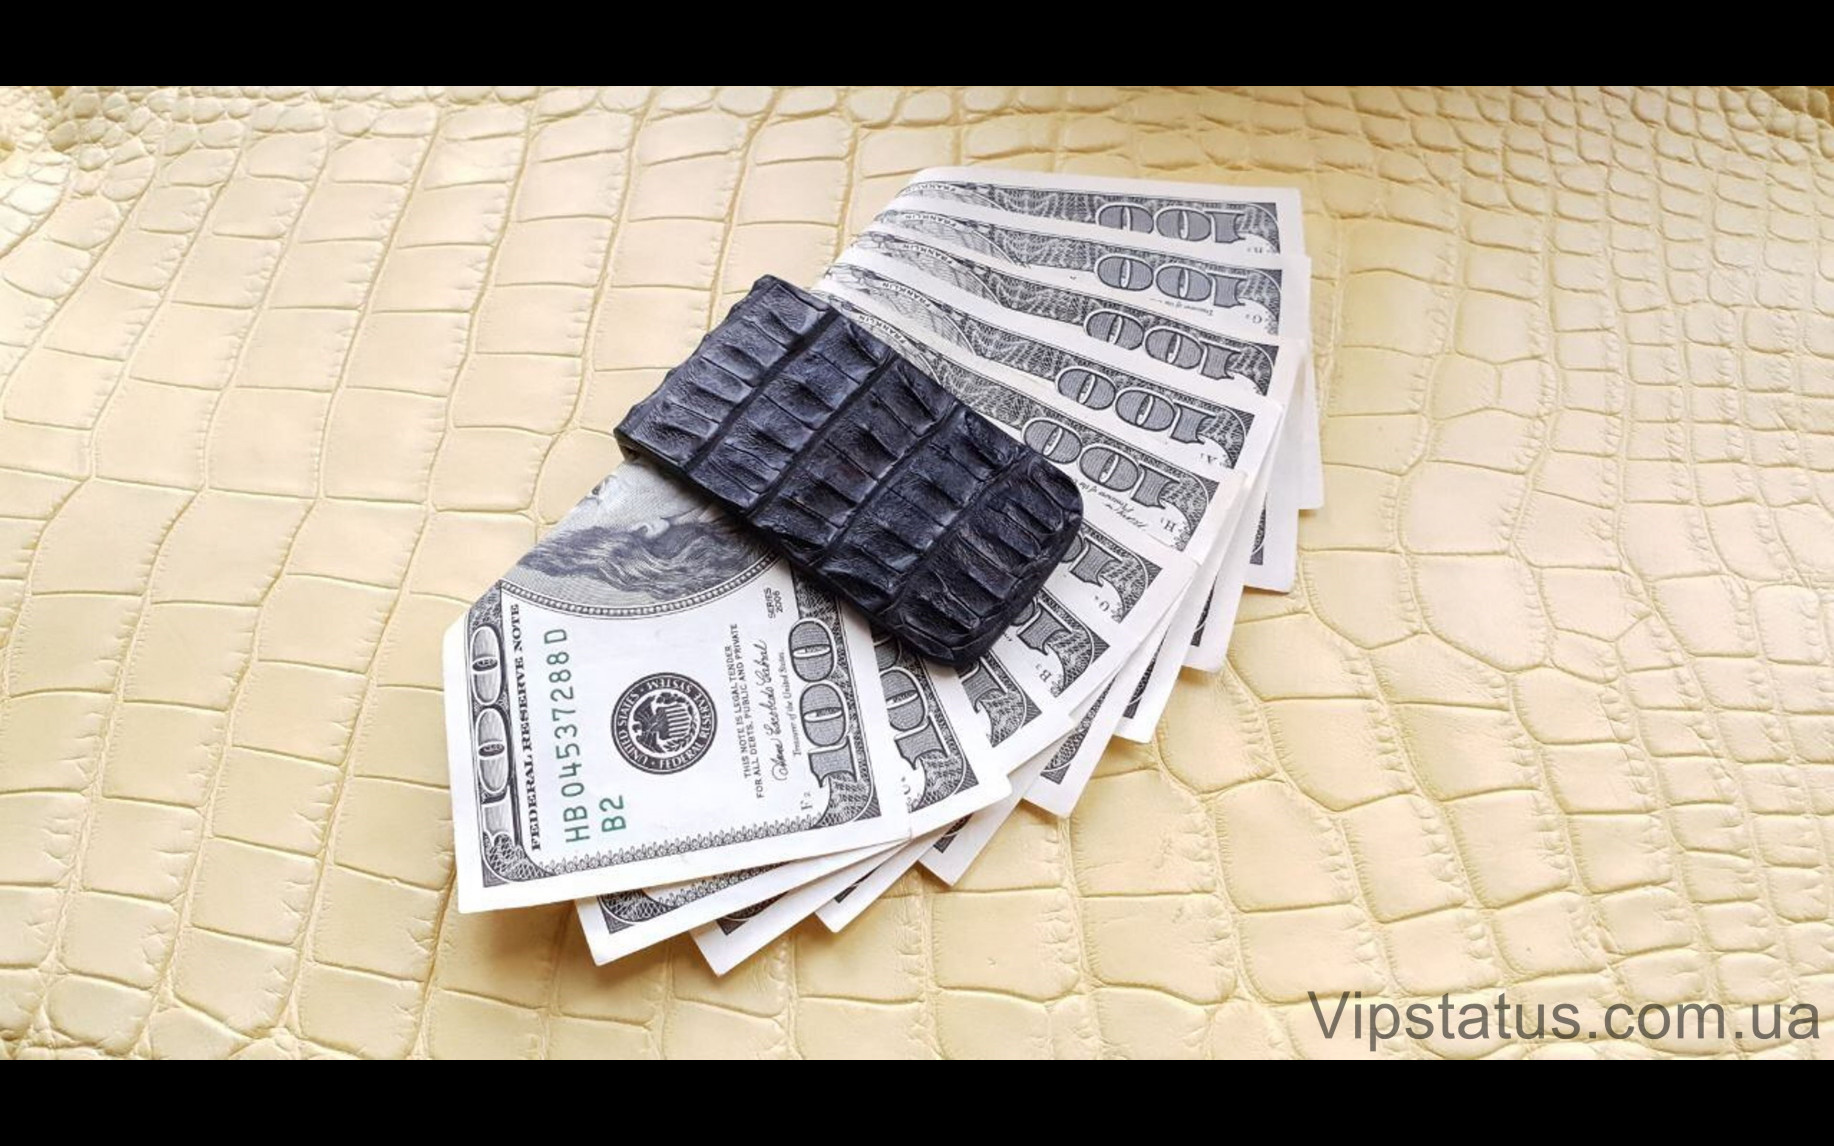 Elite Black King Премиум зажим для купюр Black King Premium bill clip image 1